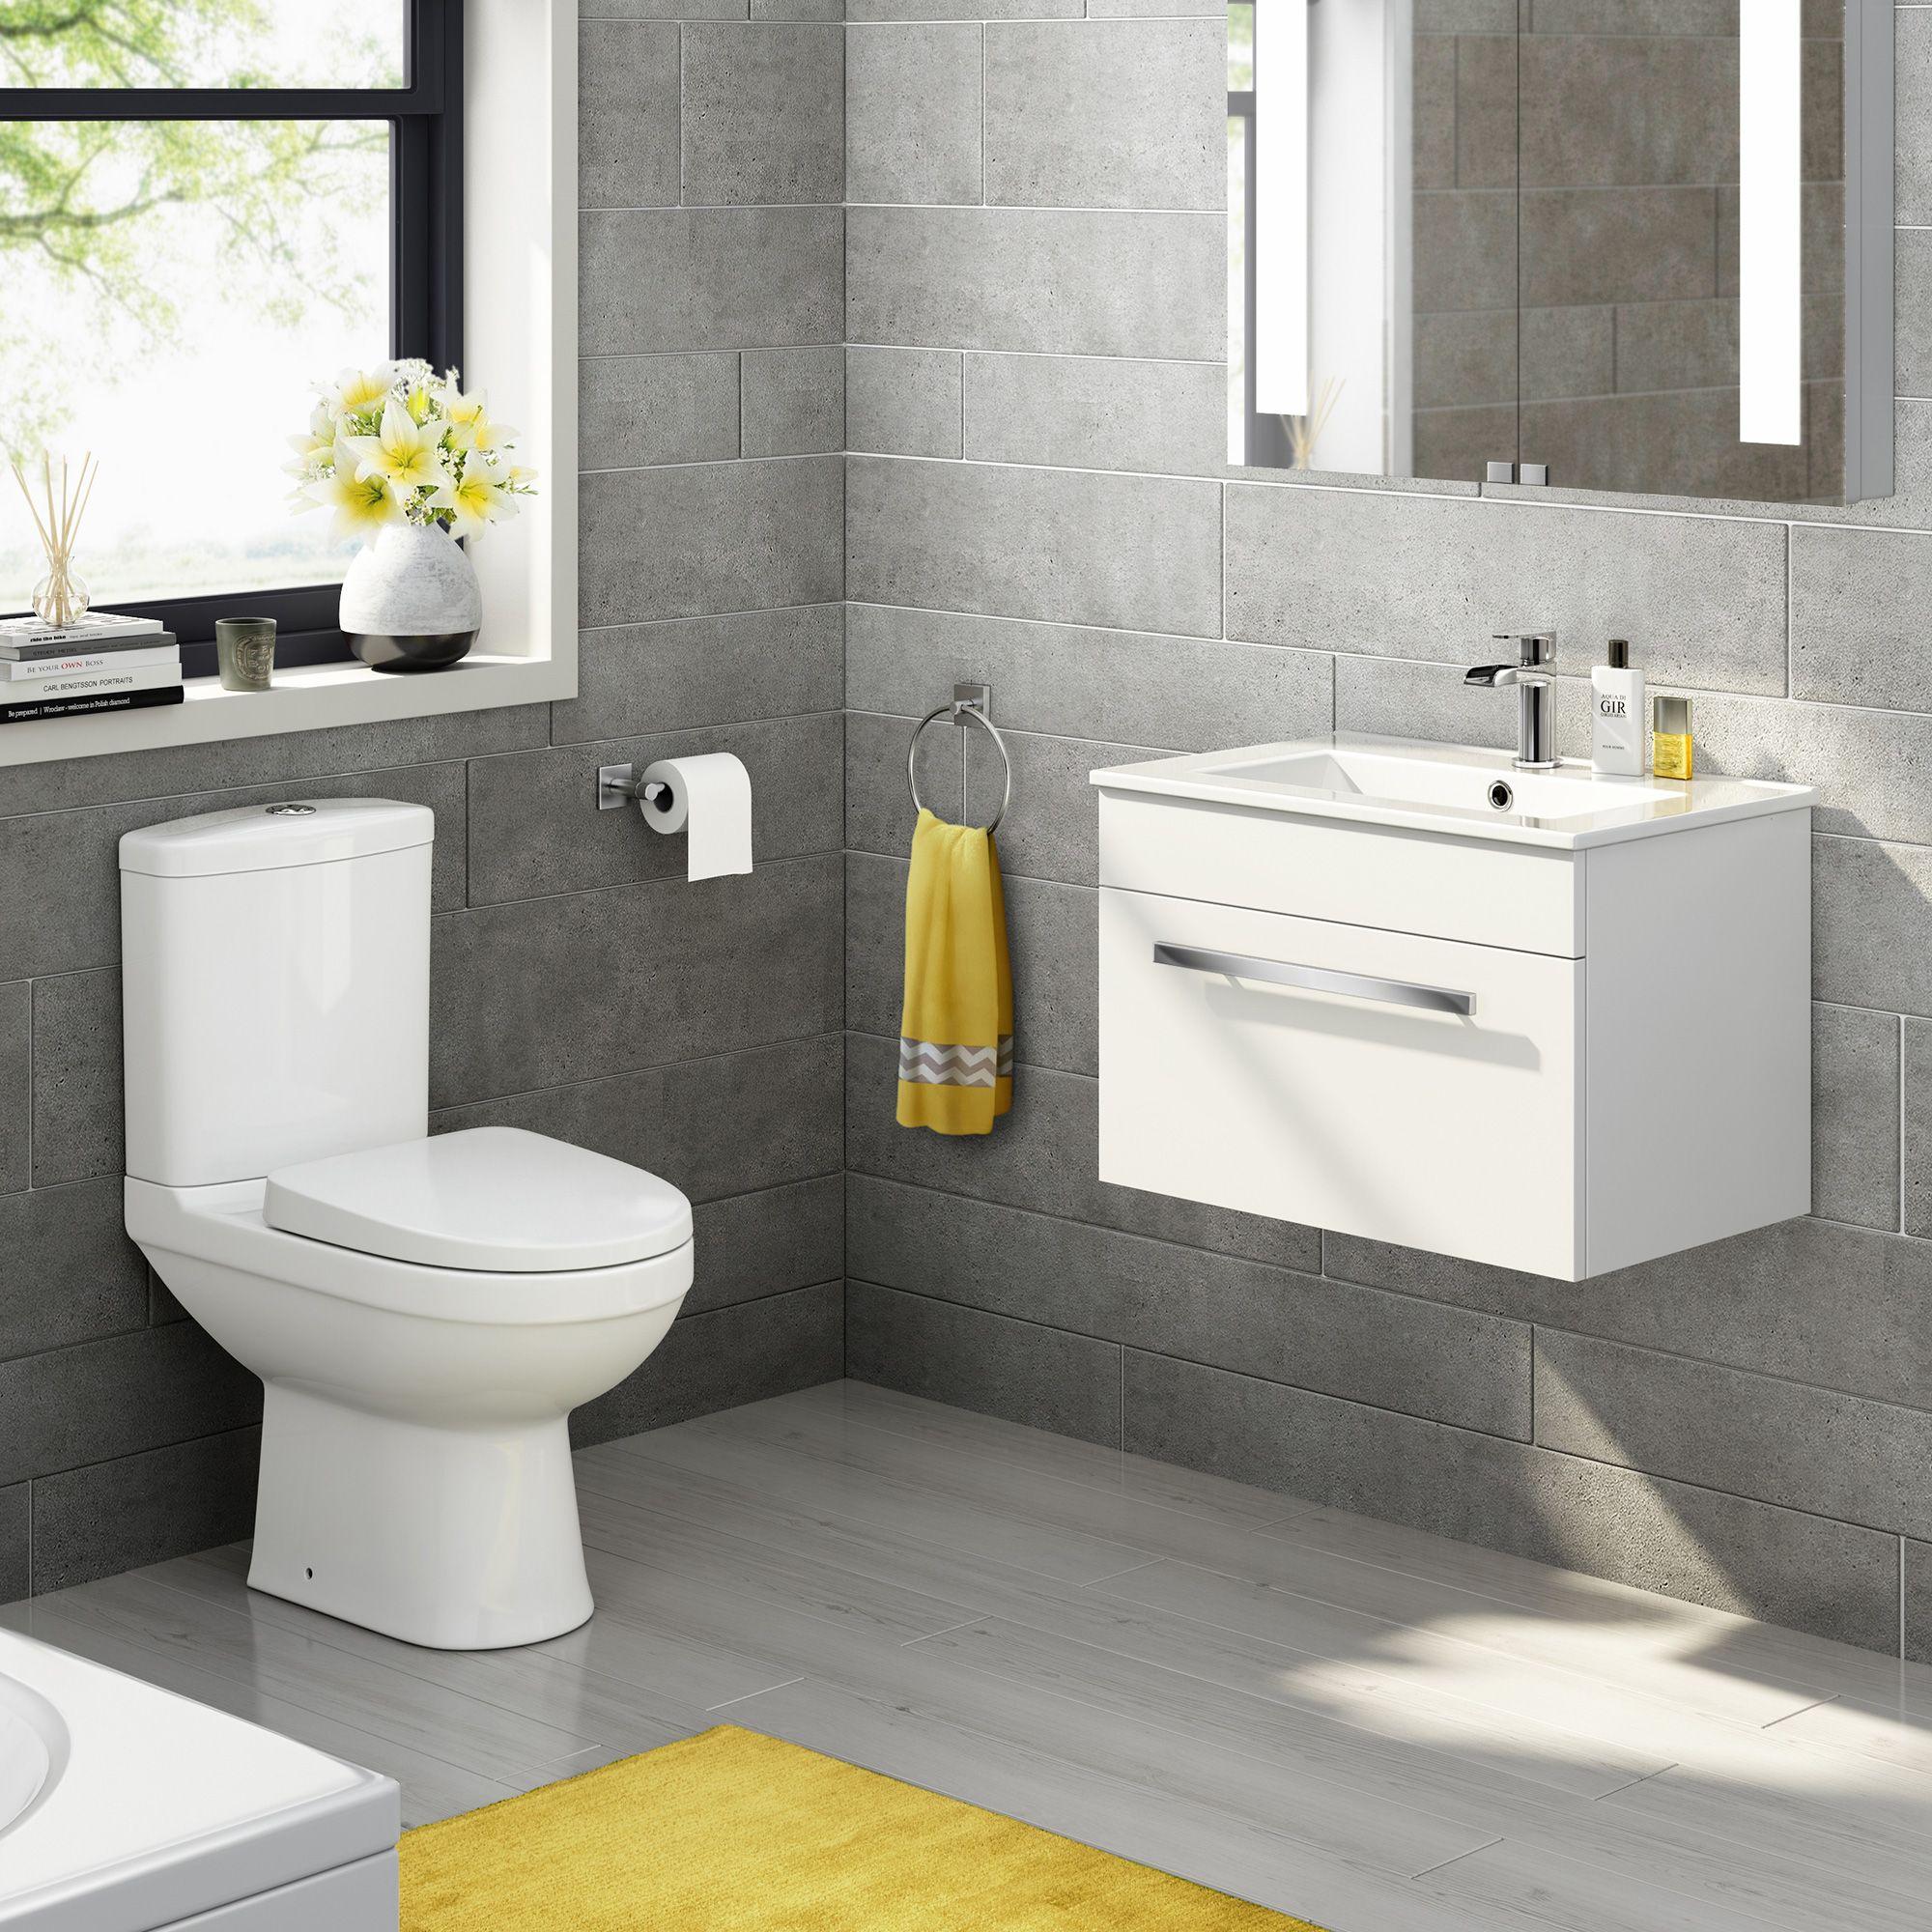 Designer Vanity Units For Bathroom Delectable 1048Mm Lyon Iii Pan Quartz Gloss White Combined Suite  Basin Inspiration Design